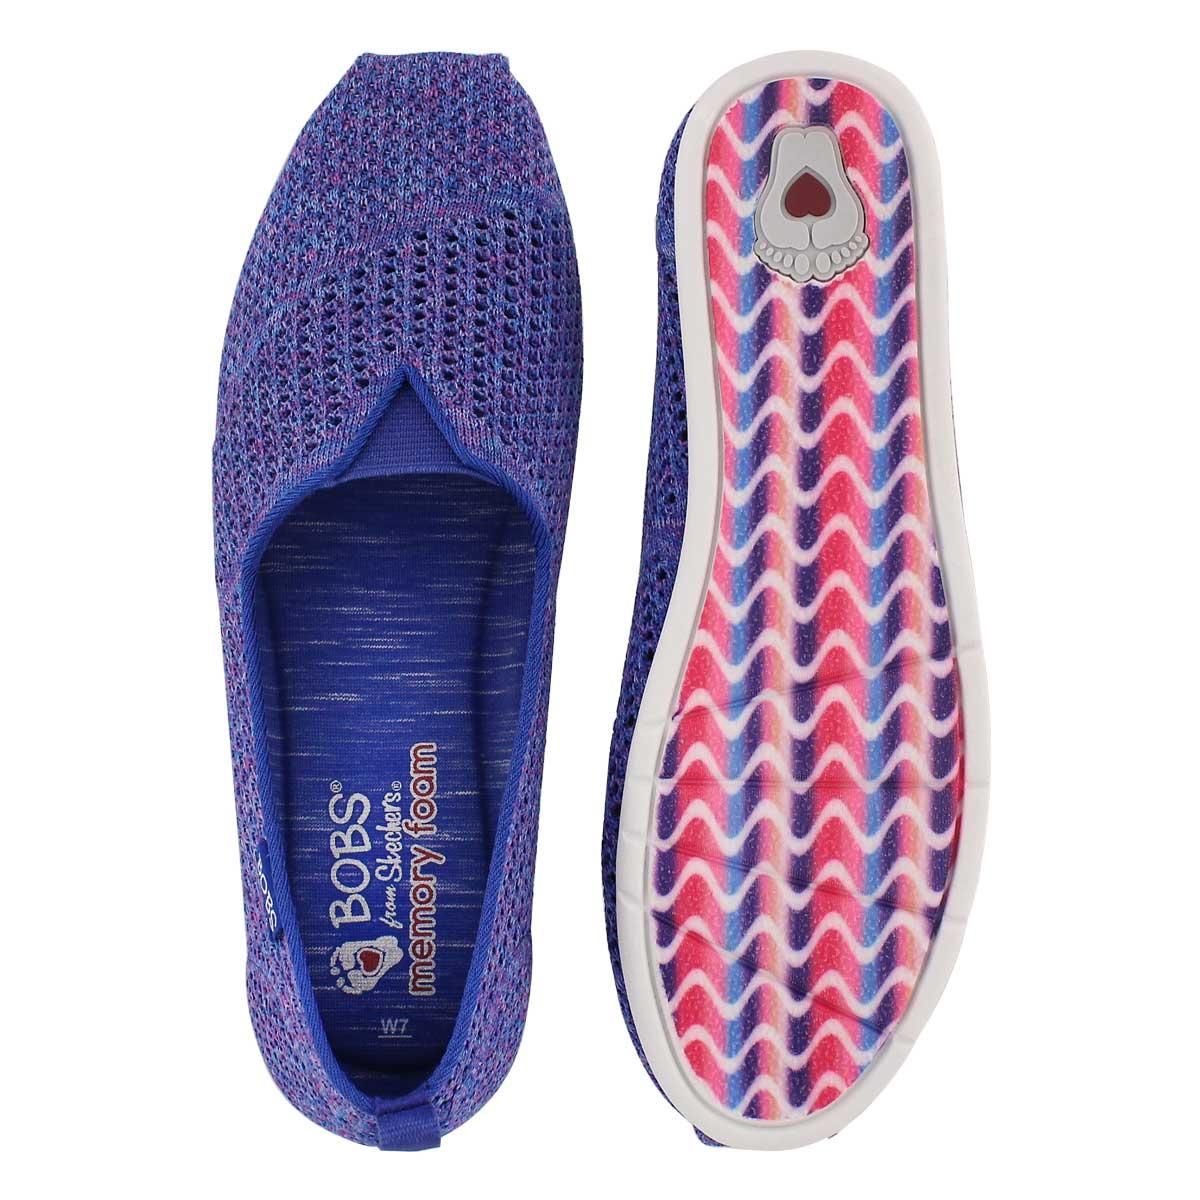 Lds Bobs Plush Lite Be Cool blue slipon